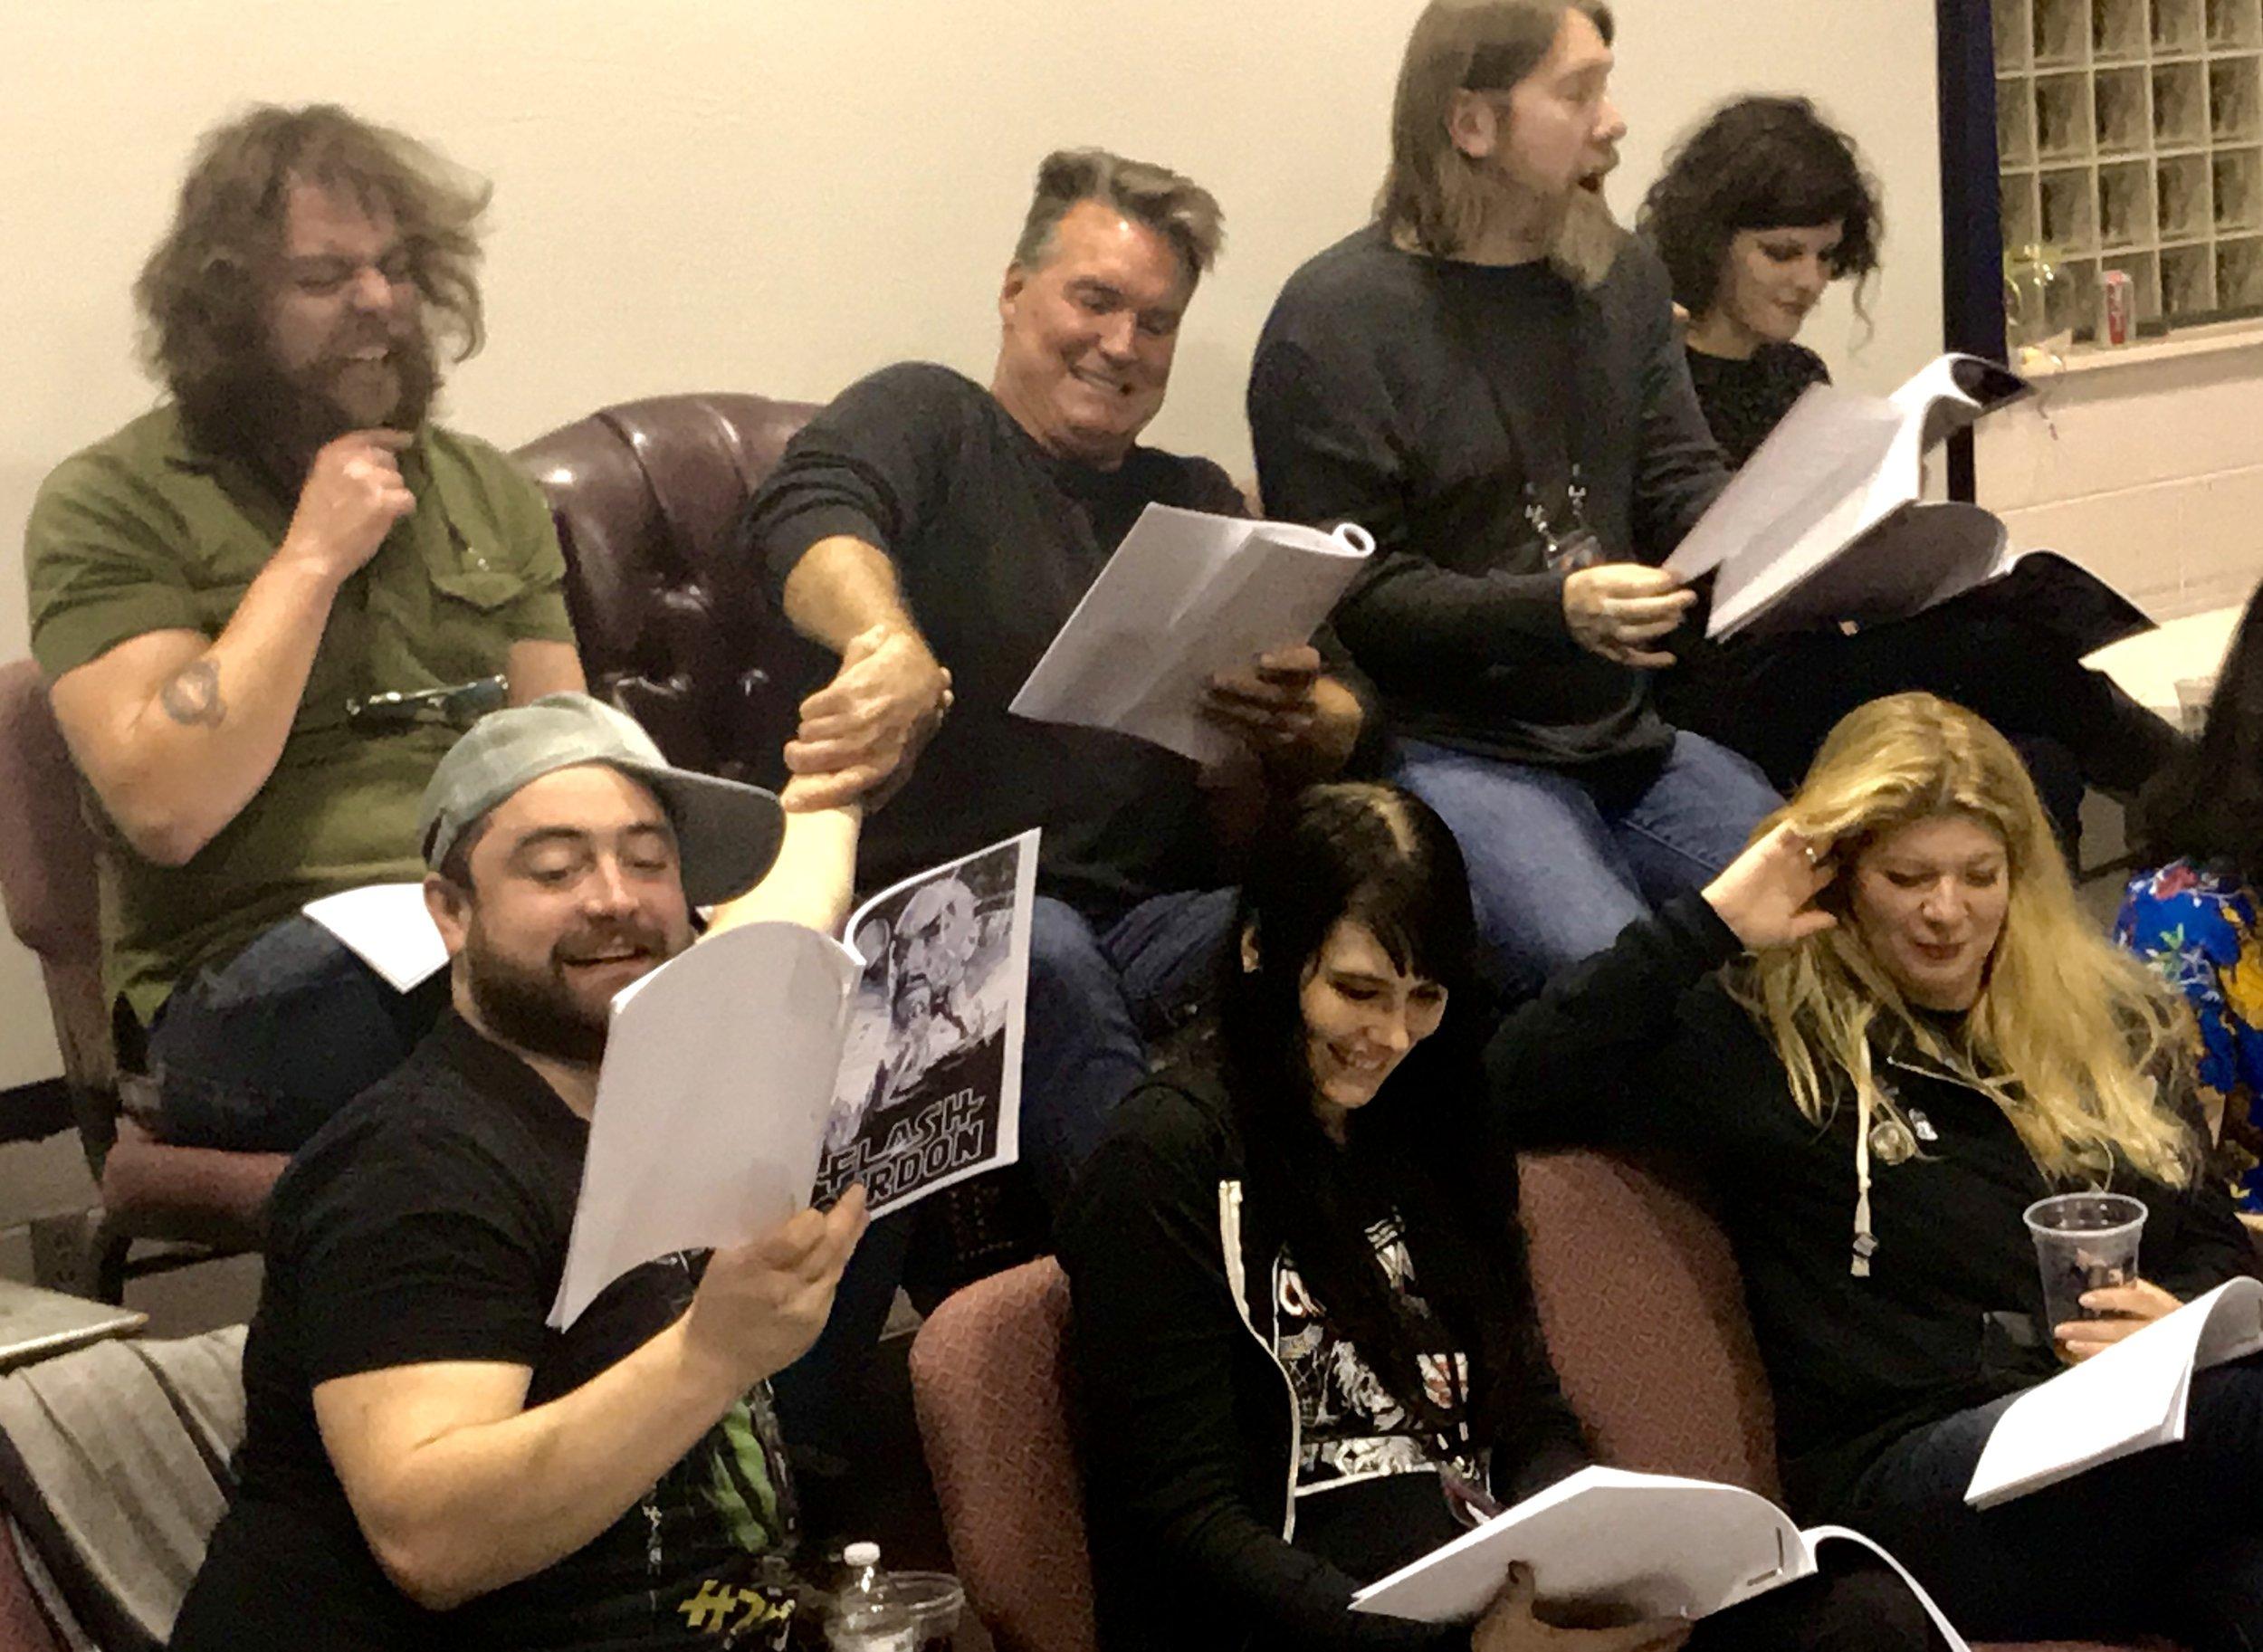 """Flash Gordon"" actor Sam Jones (center) leads a table read of that film's script. (Photo: Bex Feldbin)"